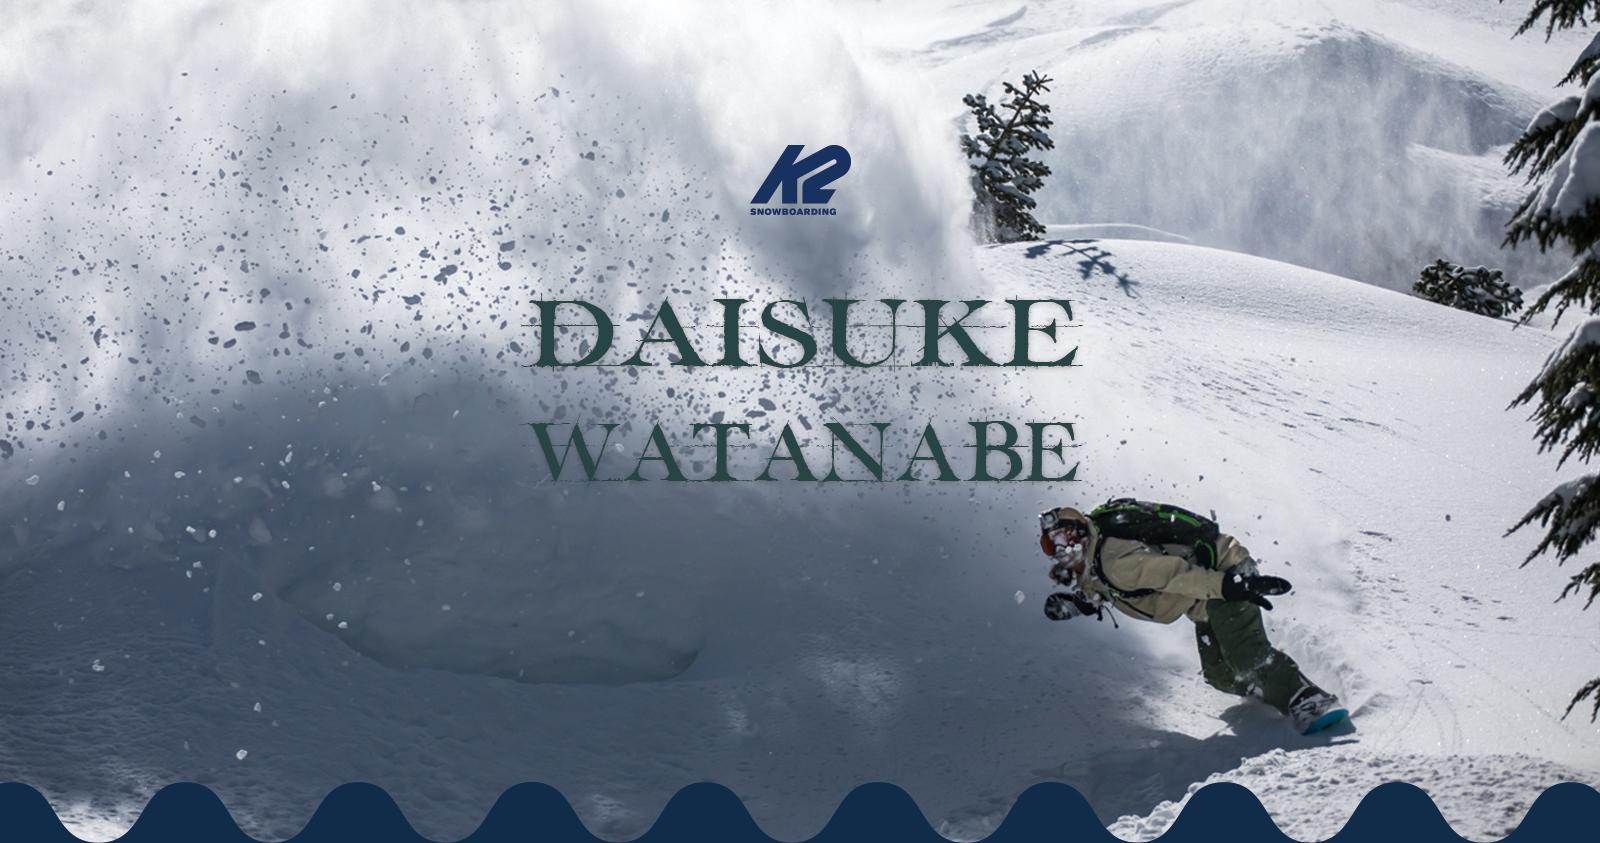 渡辺大介 daisuke watanabe k2